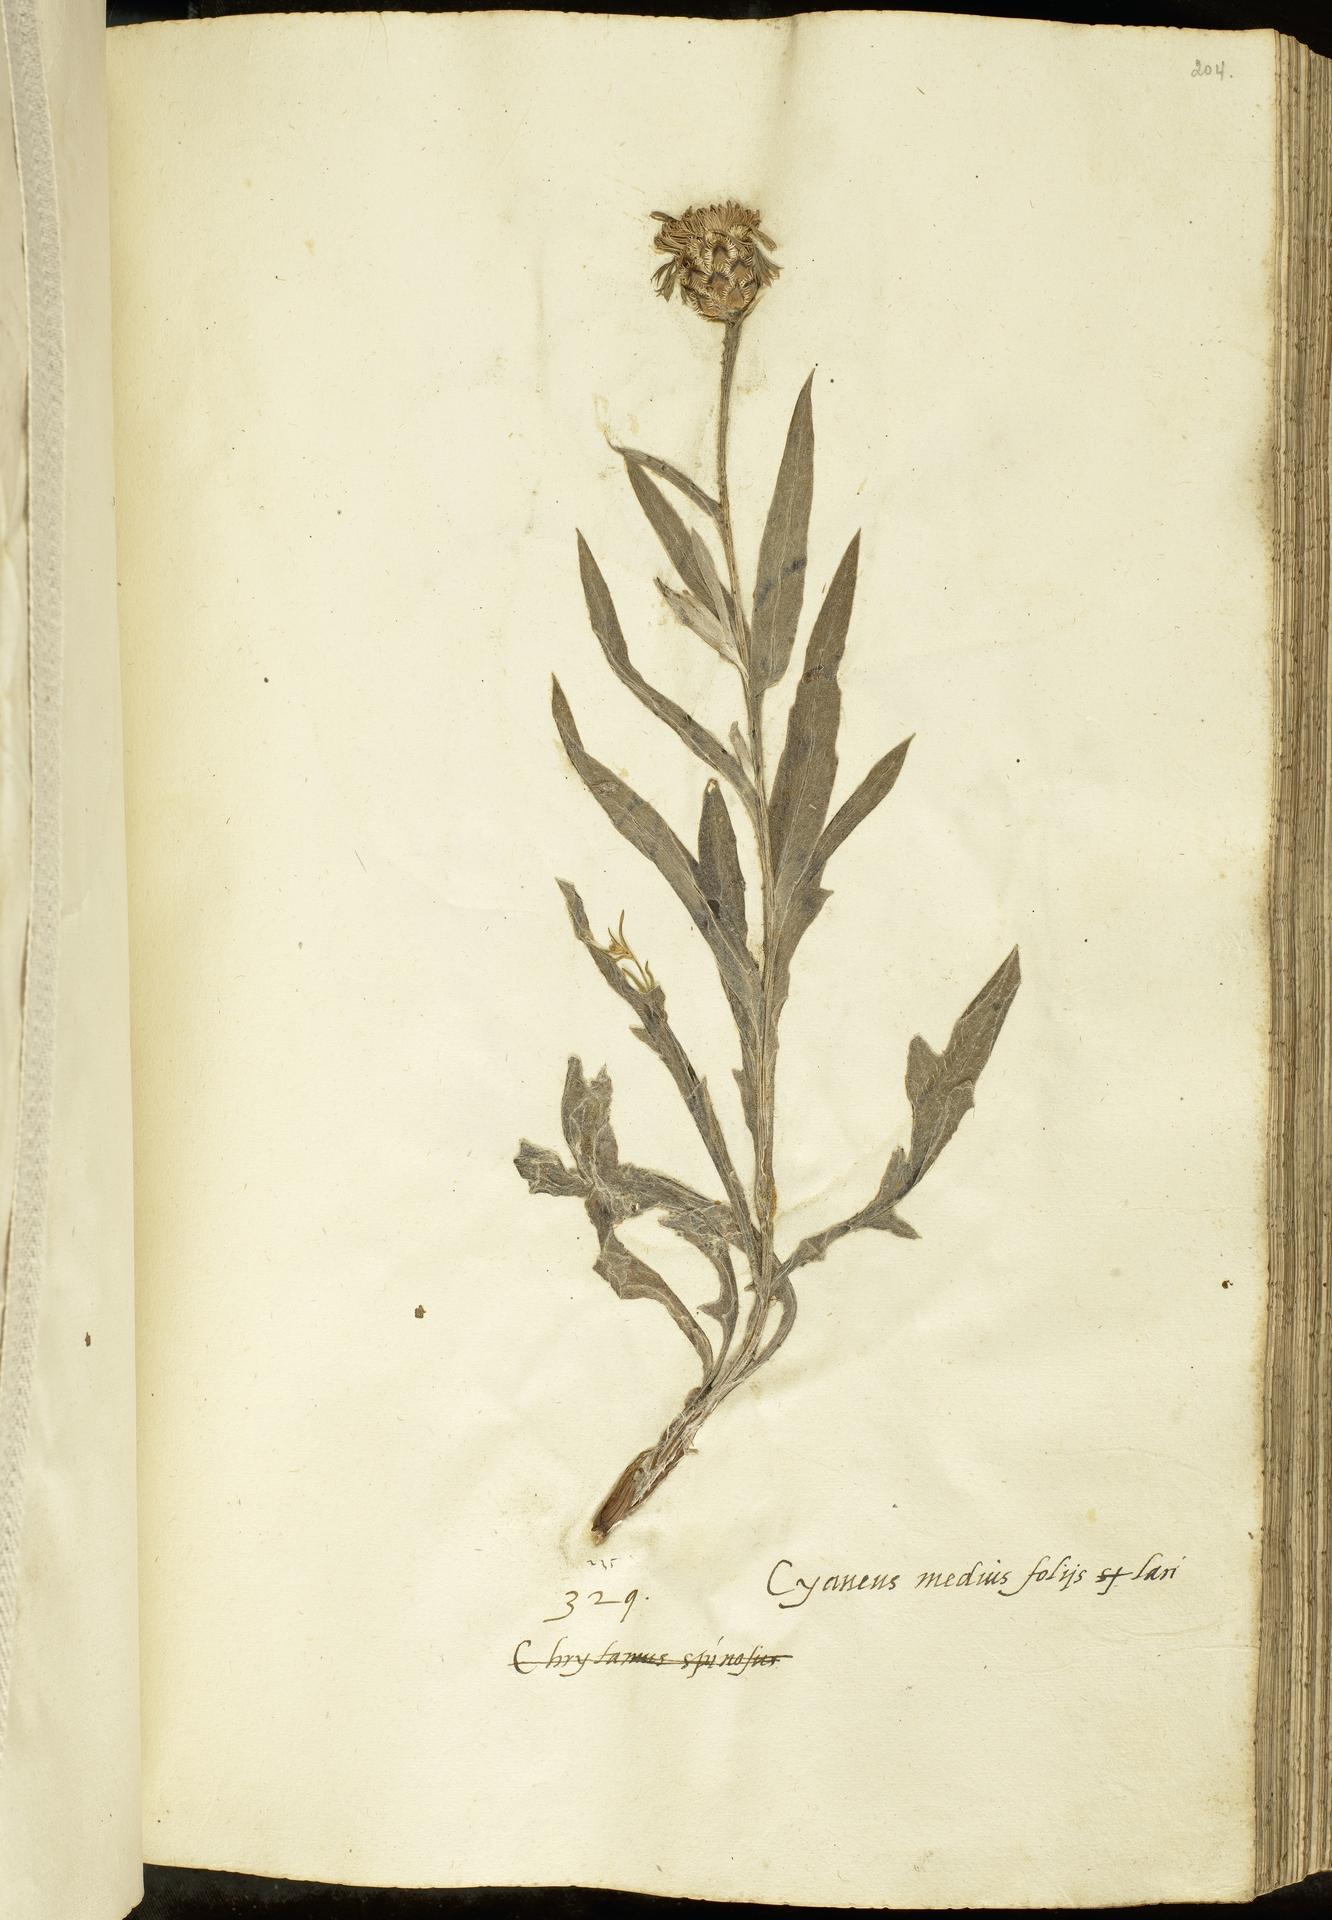 L.2111127 | Cyanus triumfetti (All.) Dostál ex Á.Löve & D.Löve